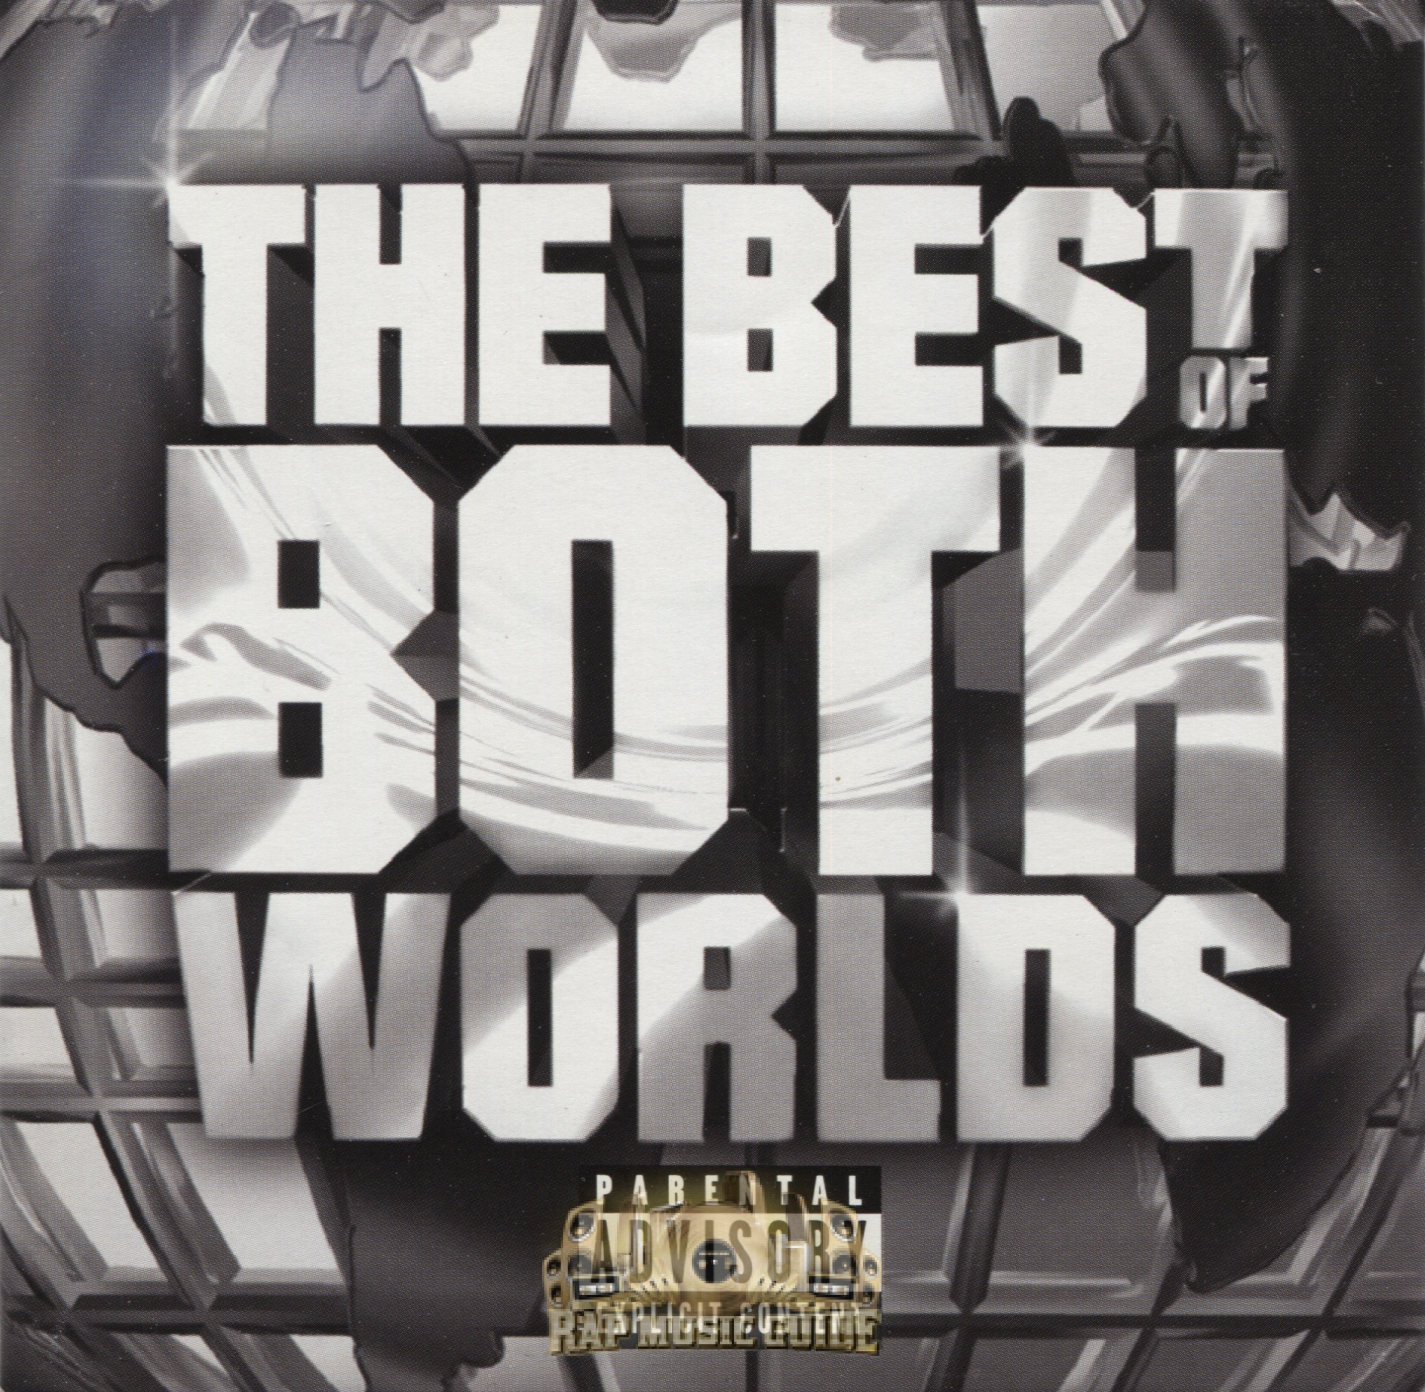 r kelly jay z the best of both worlds cd rap music guide r kelly jay z the best of both worlds